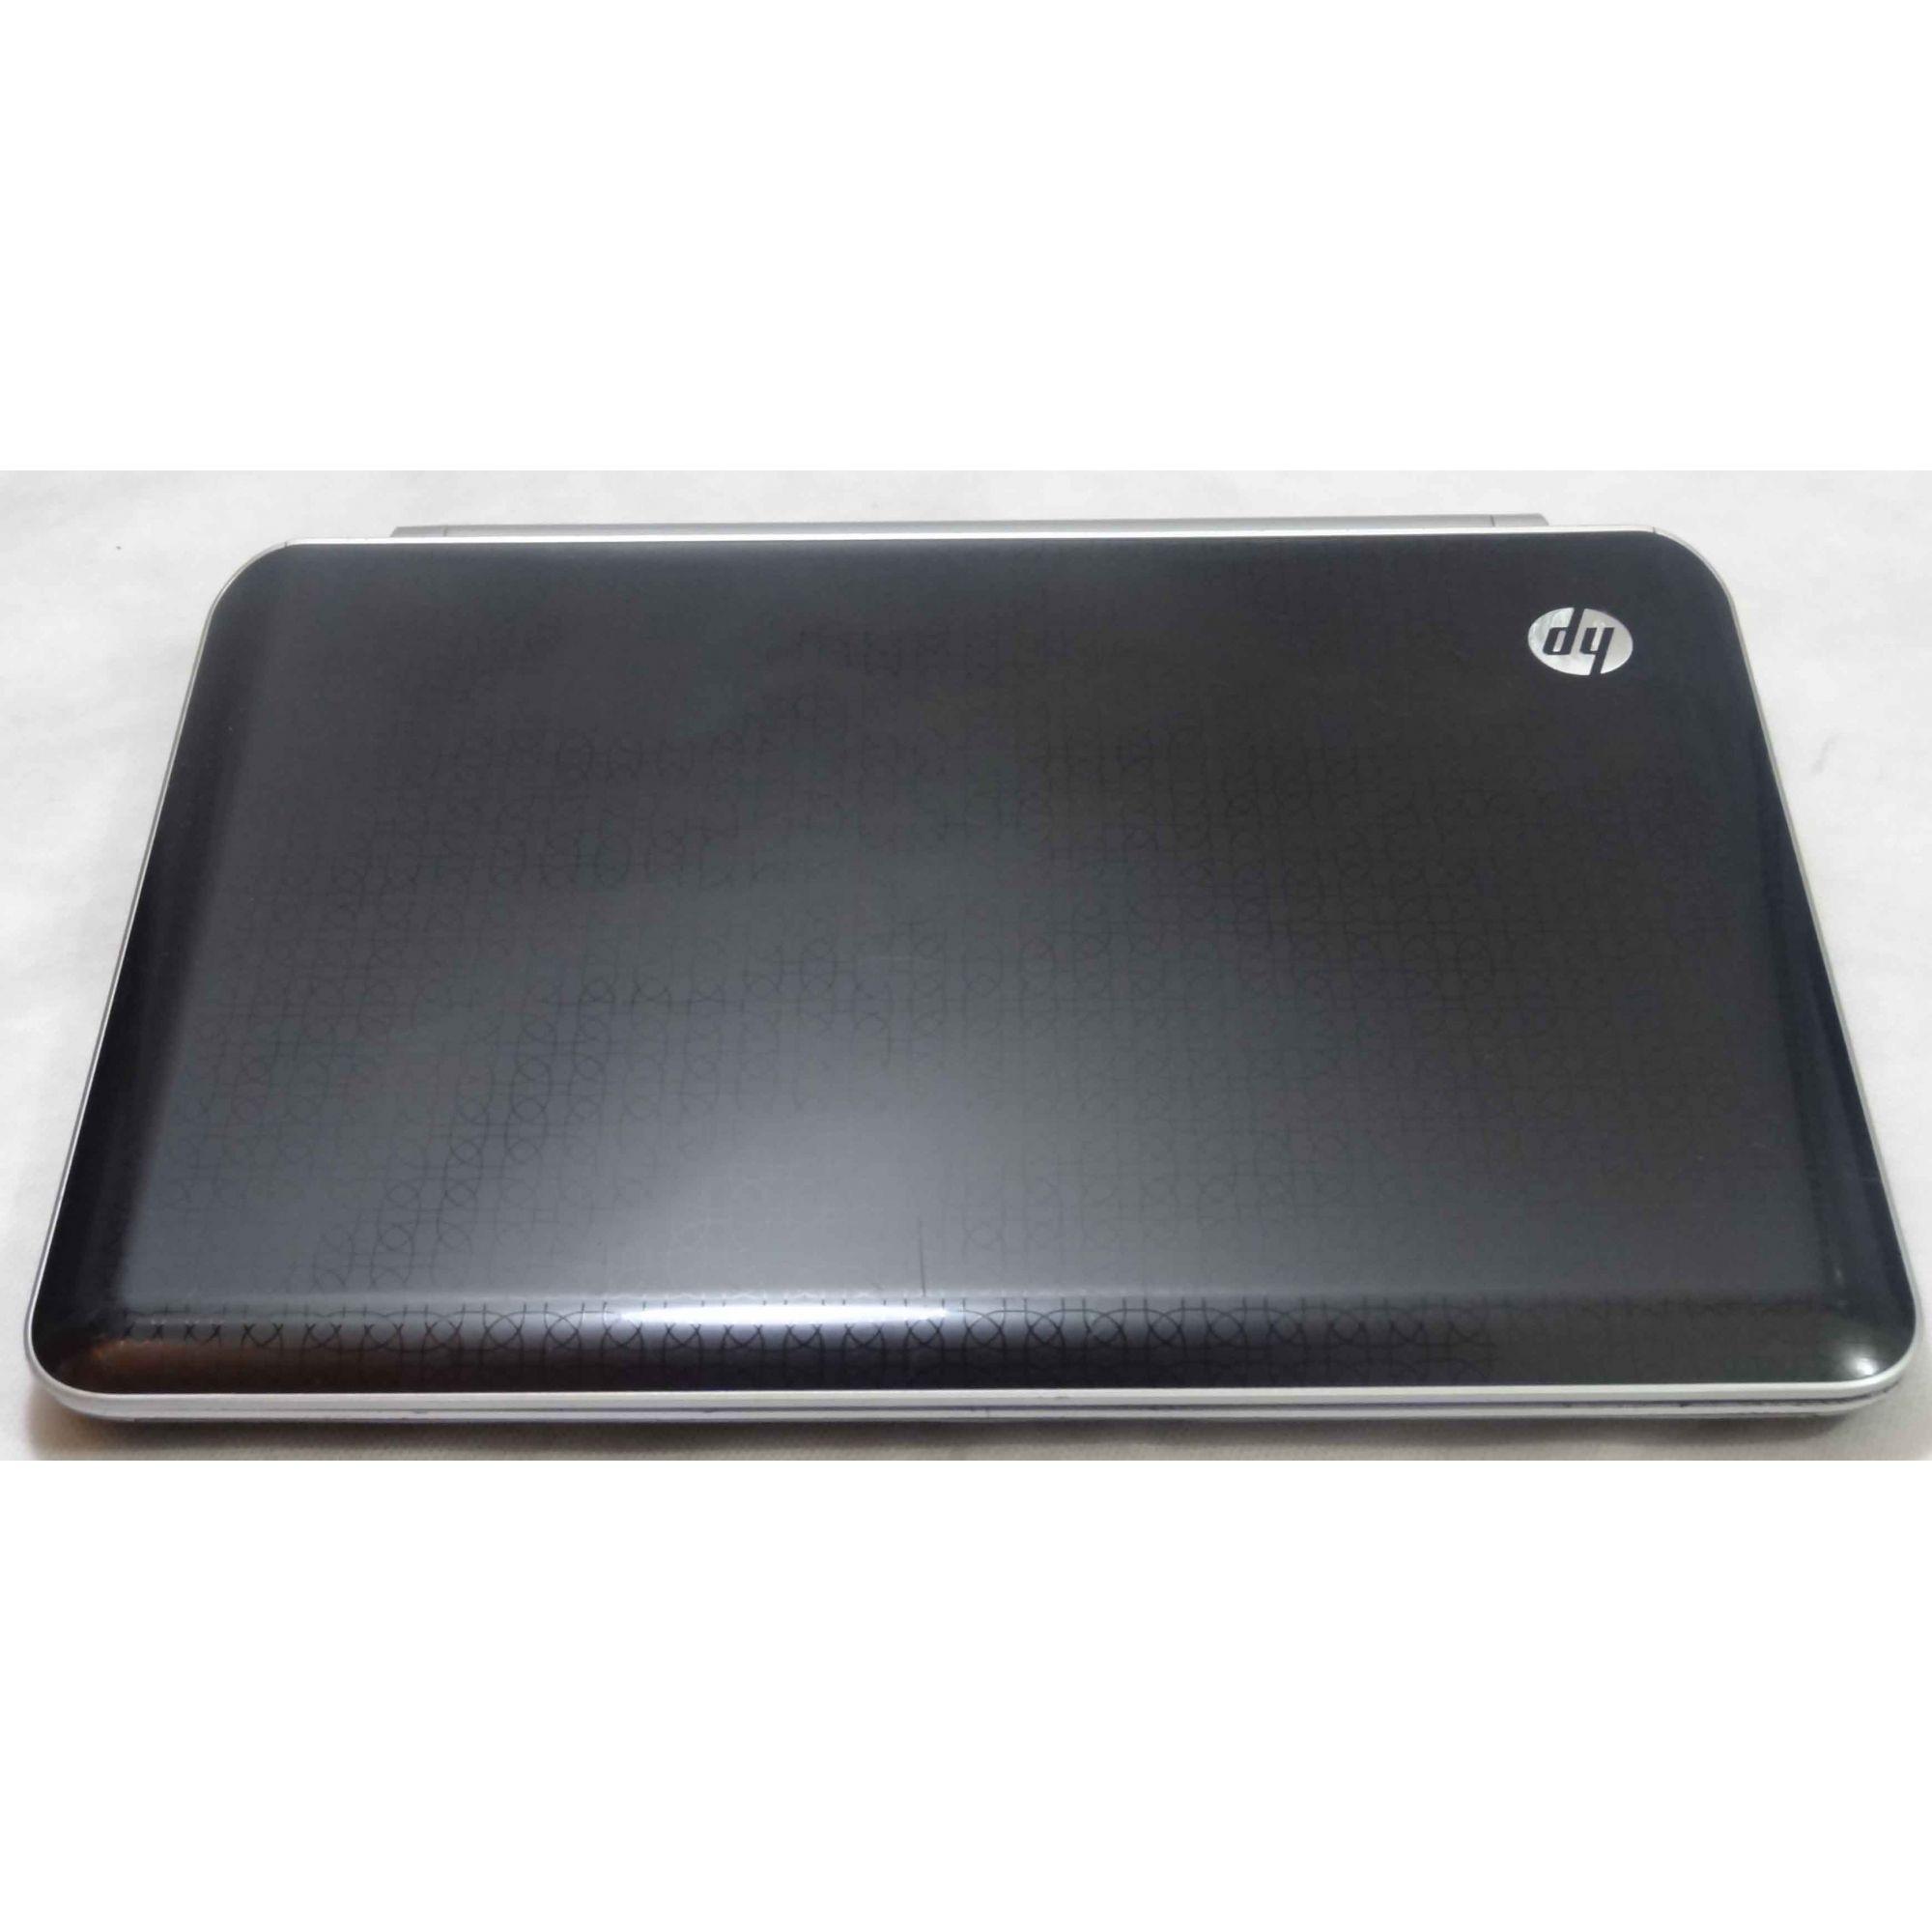 Notebook HP Pavilion Dm1 11.6'' AMD E-350 Dual Core 1.6GHz 3GB HD-500GB